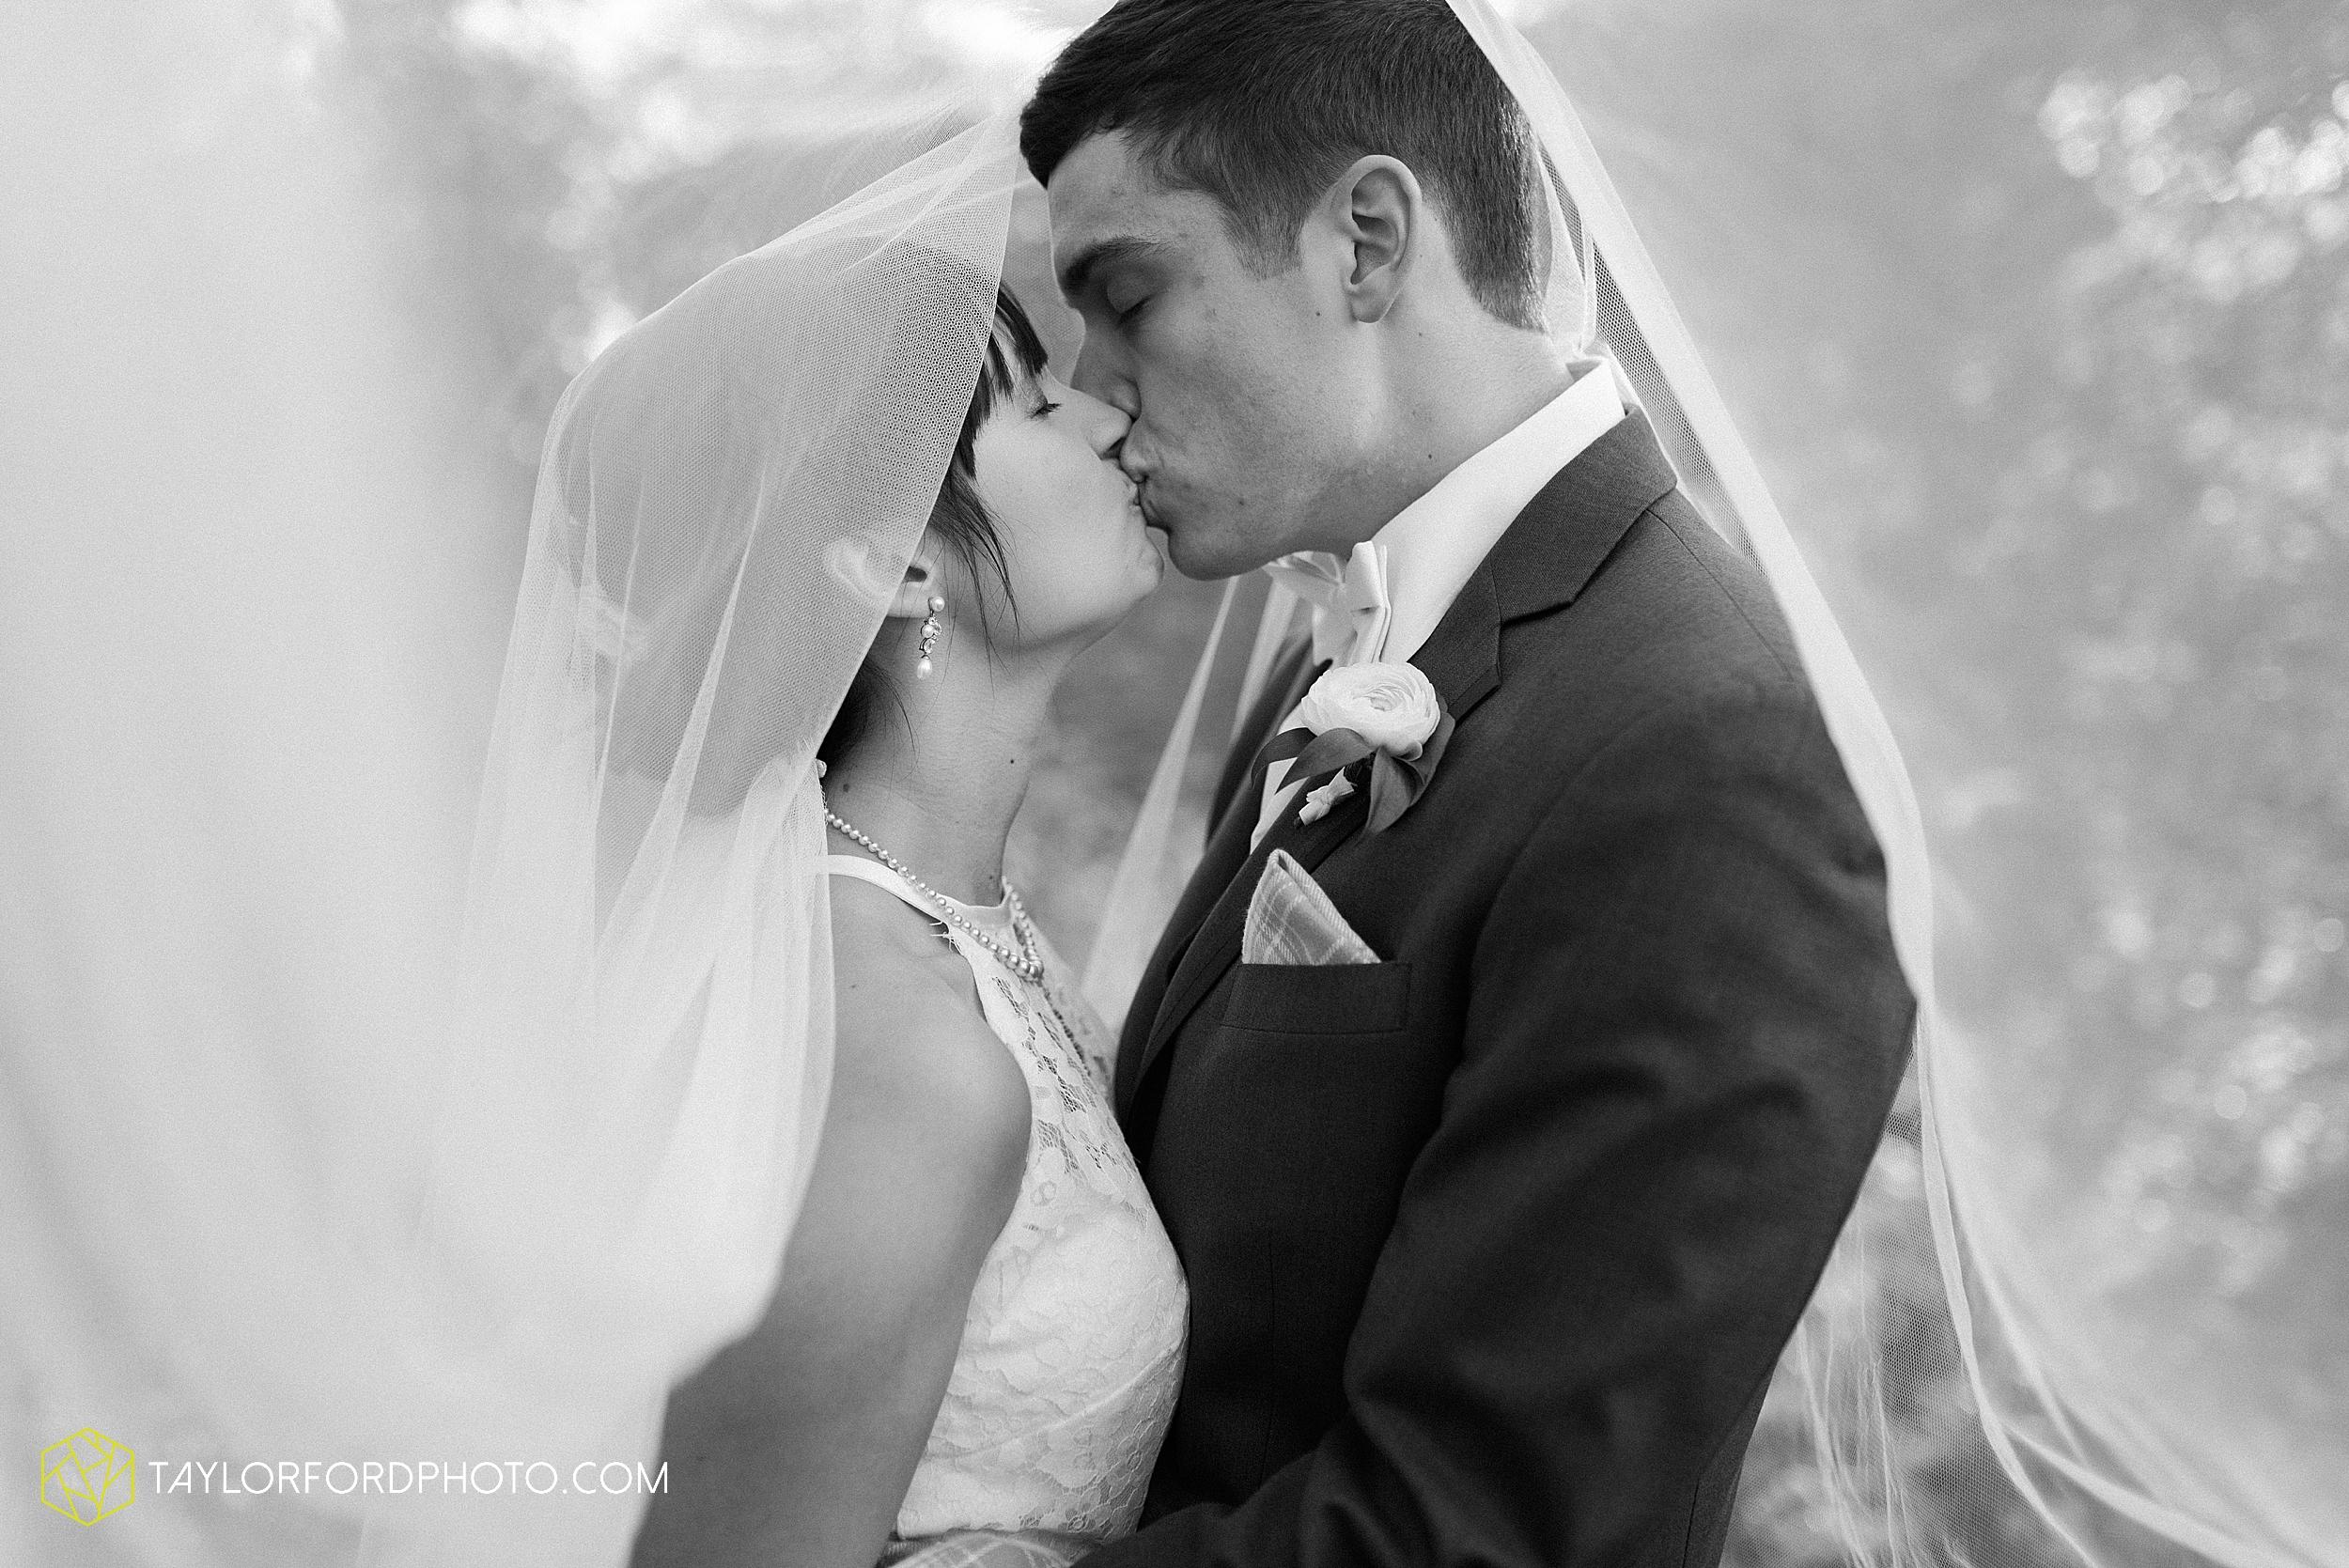 marissa-nicole-nick-daeger-orrmont-estate-farm-wedding-piqua-dayton-troy-ohio-fall-photographer-taylor-ford-photography_1549.jpg